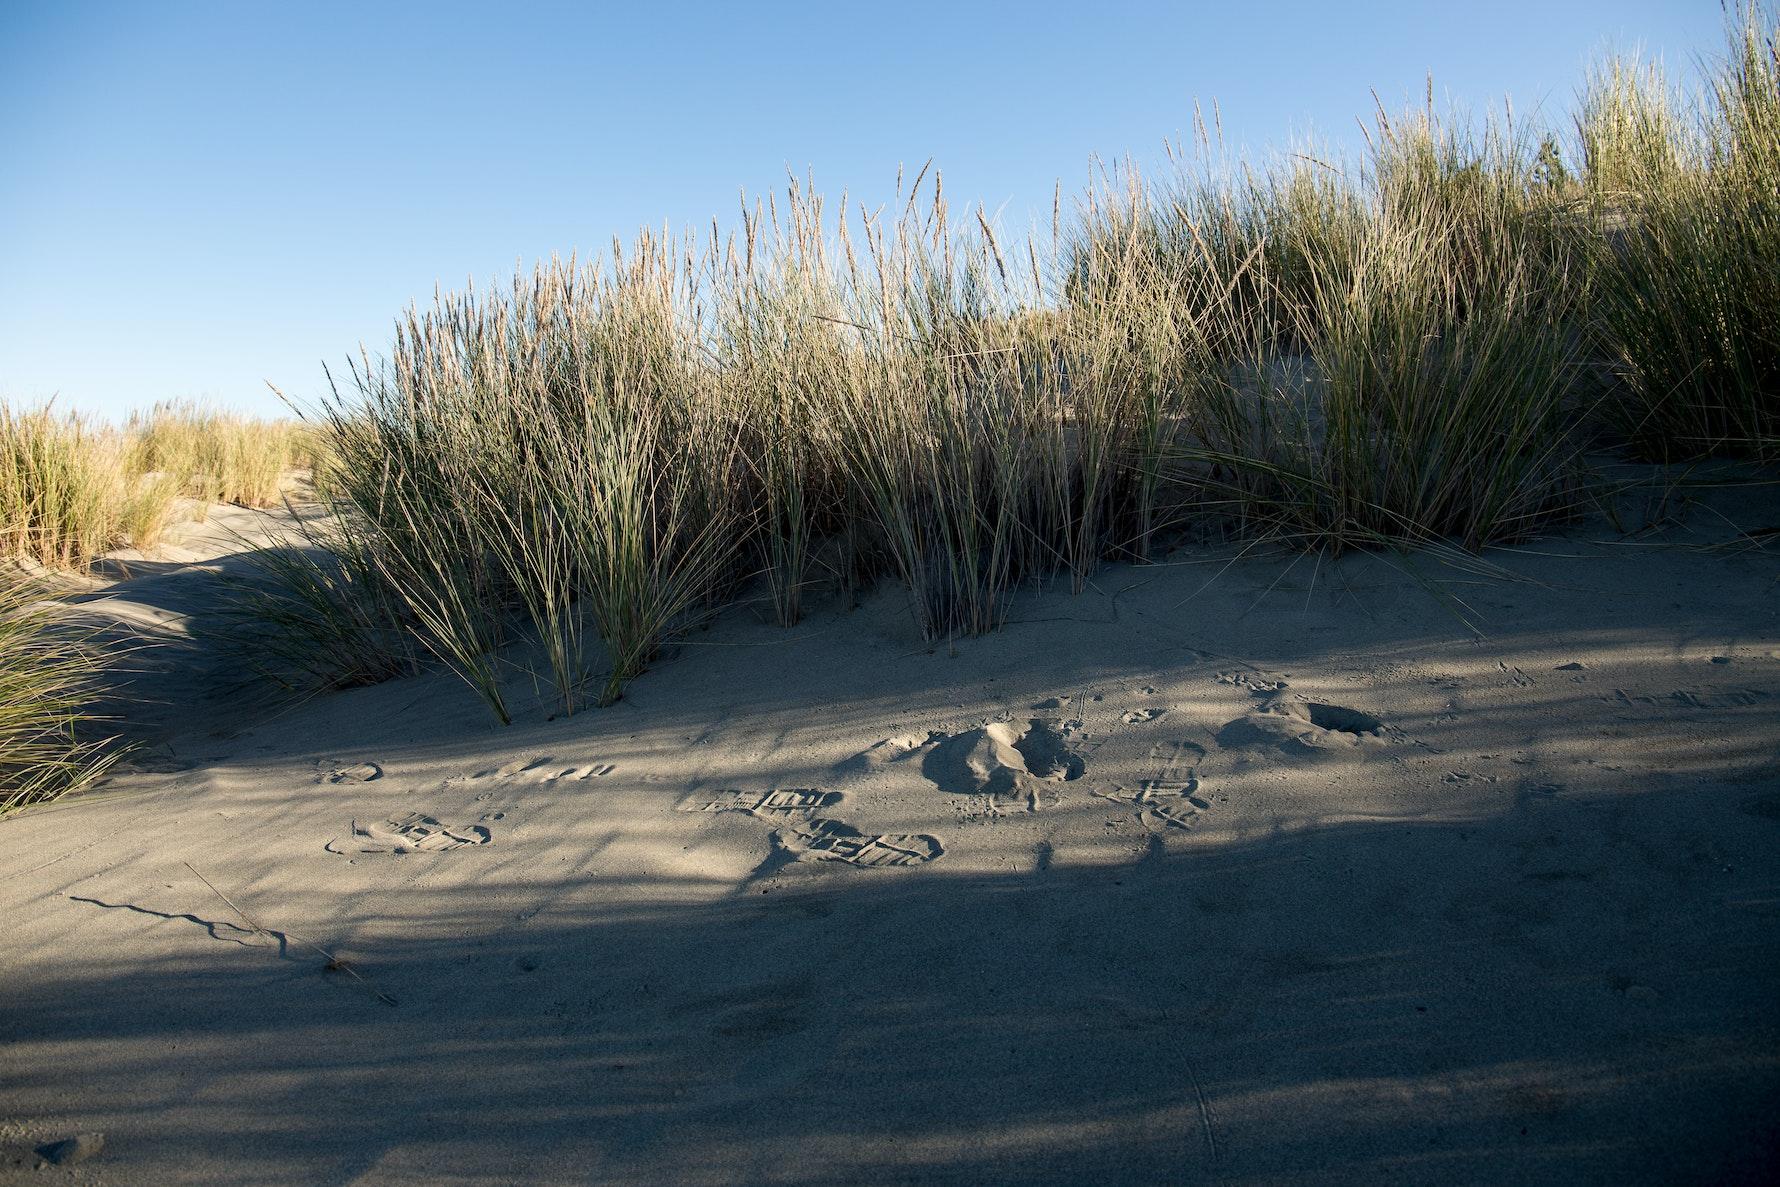 Pegasus Beach, Kaiapohia pā region.